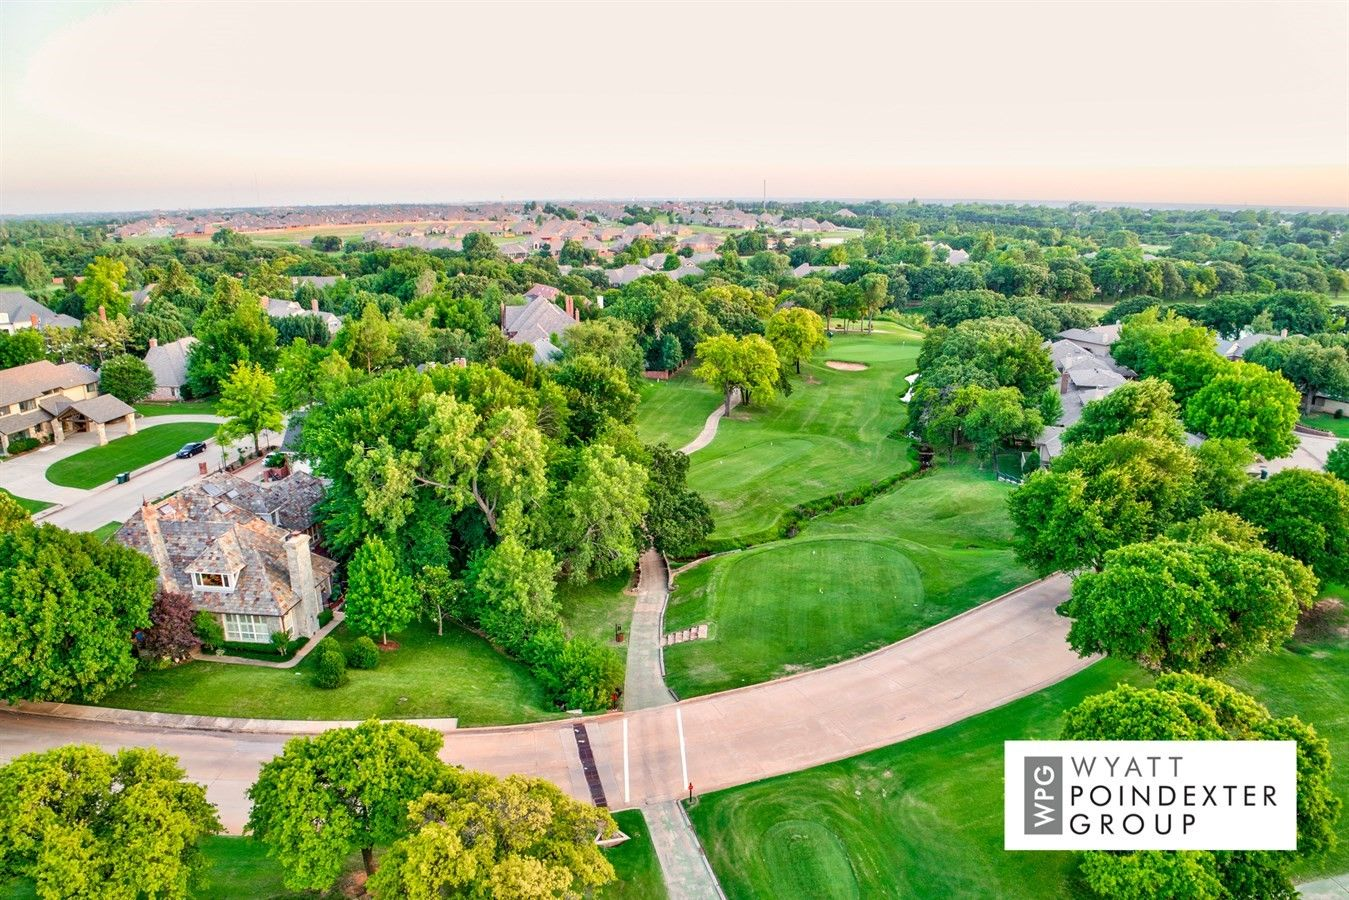 599 000 New Listing In Oak Tree 5721 Country Club Terr Edmond Ok Website Www 5721countryclub Com Golf Course Lot Oak Tree Golf Courses Real Estate